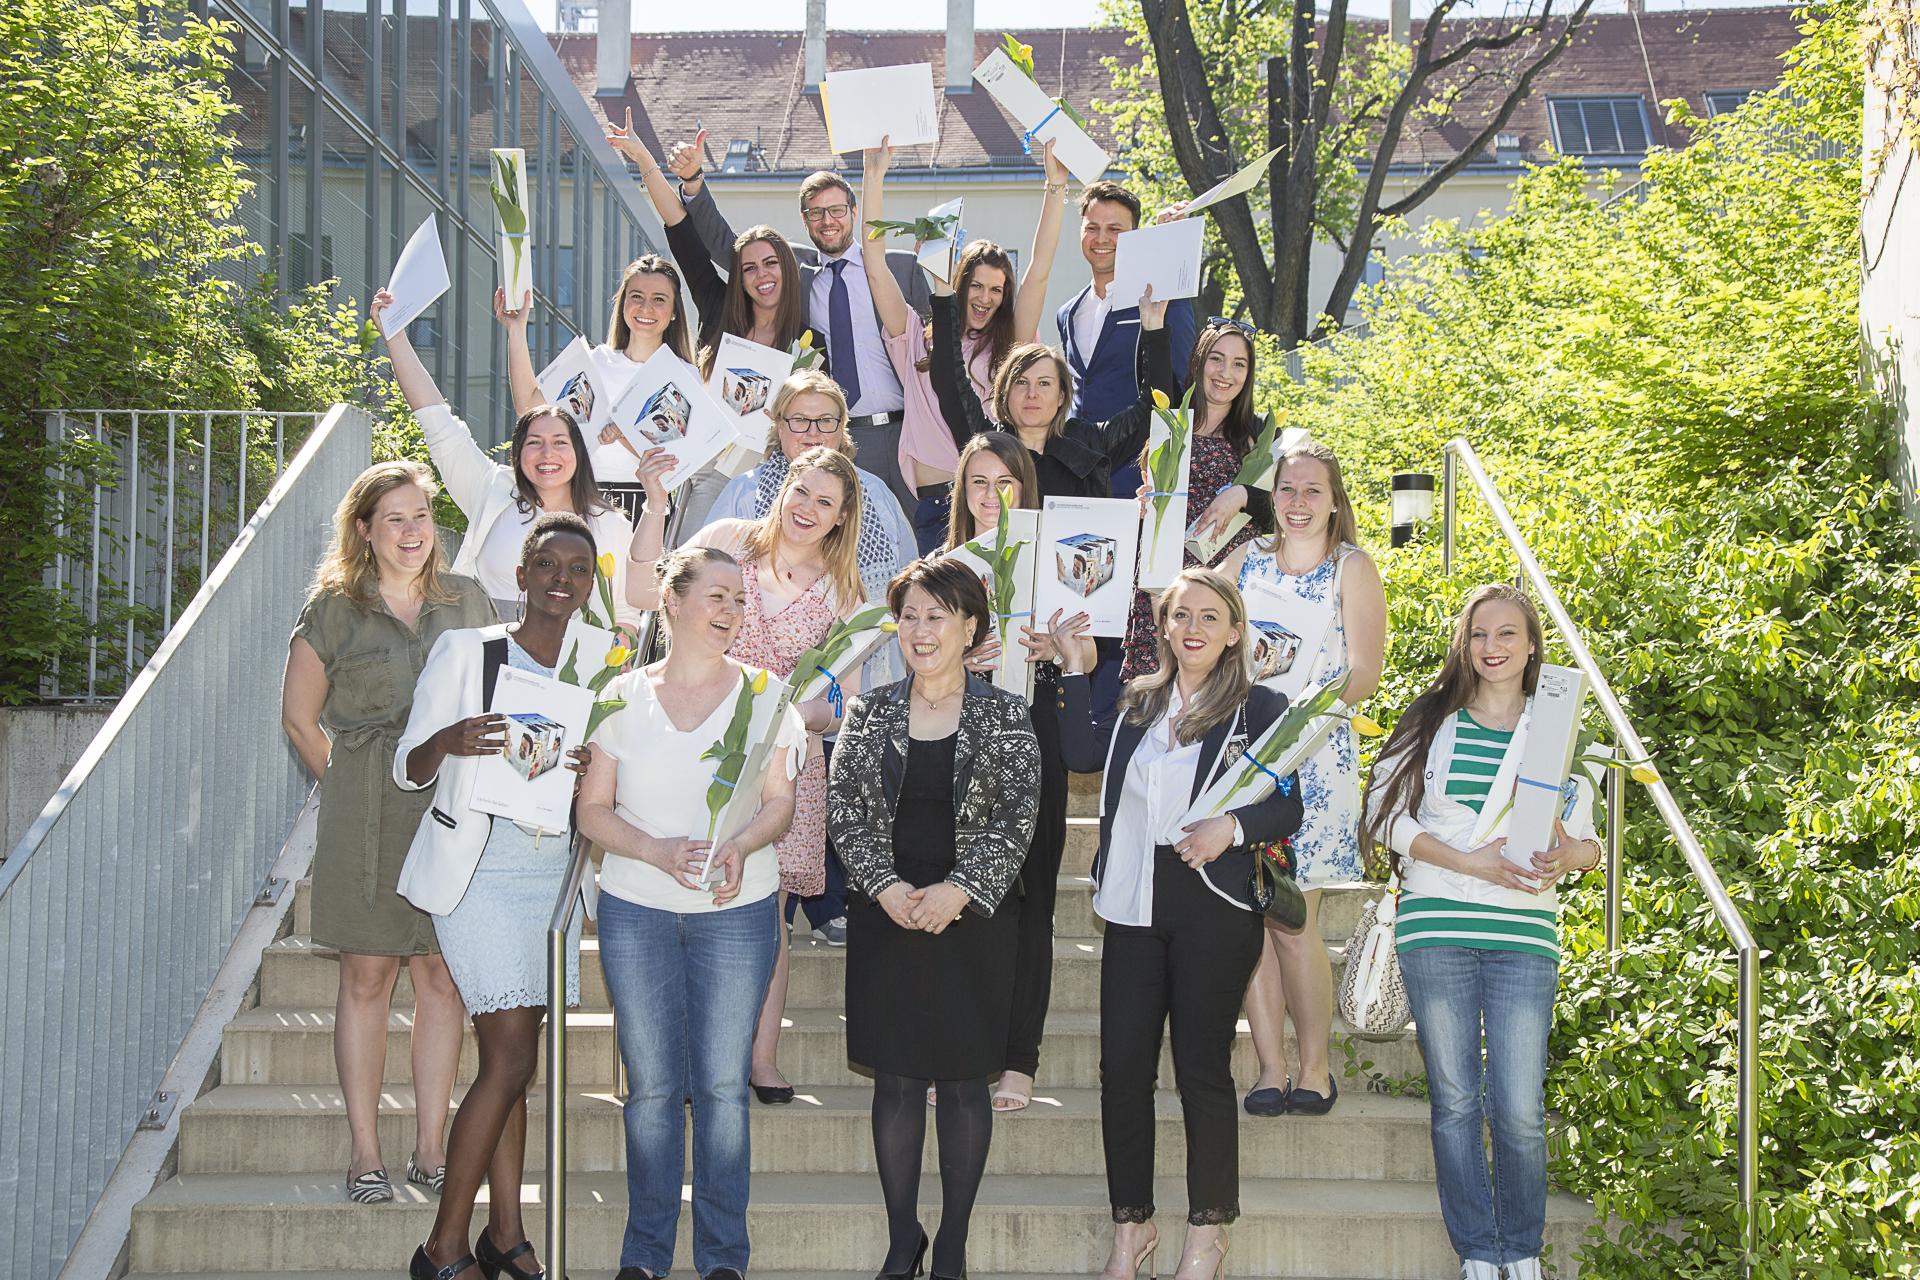 Abb4: Absolventinnen des Jahrgang 2018/2018 - Foto (c) Universitätszahnklinik Wien